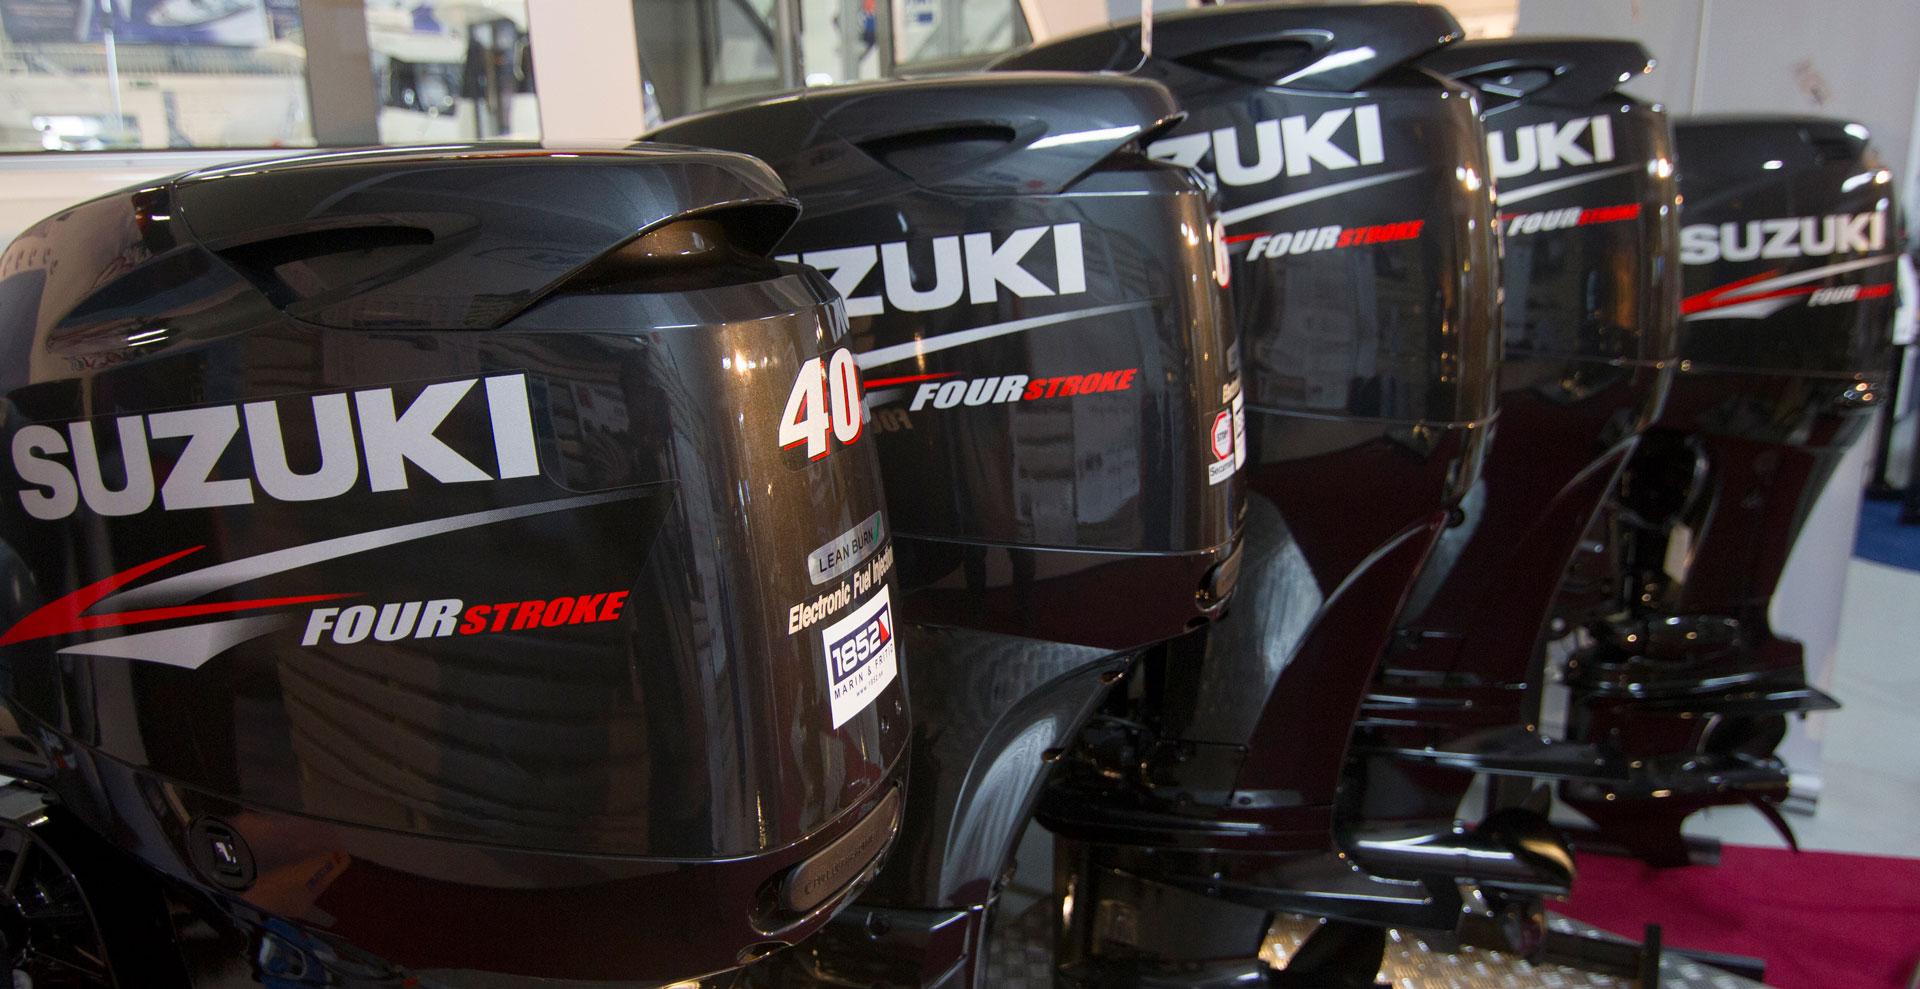 suzuki-båtmotorer-återförsäljare